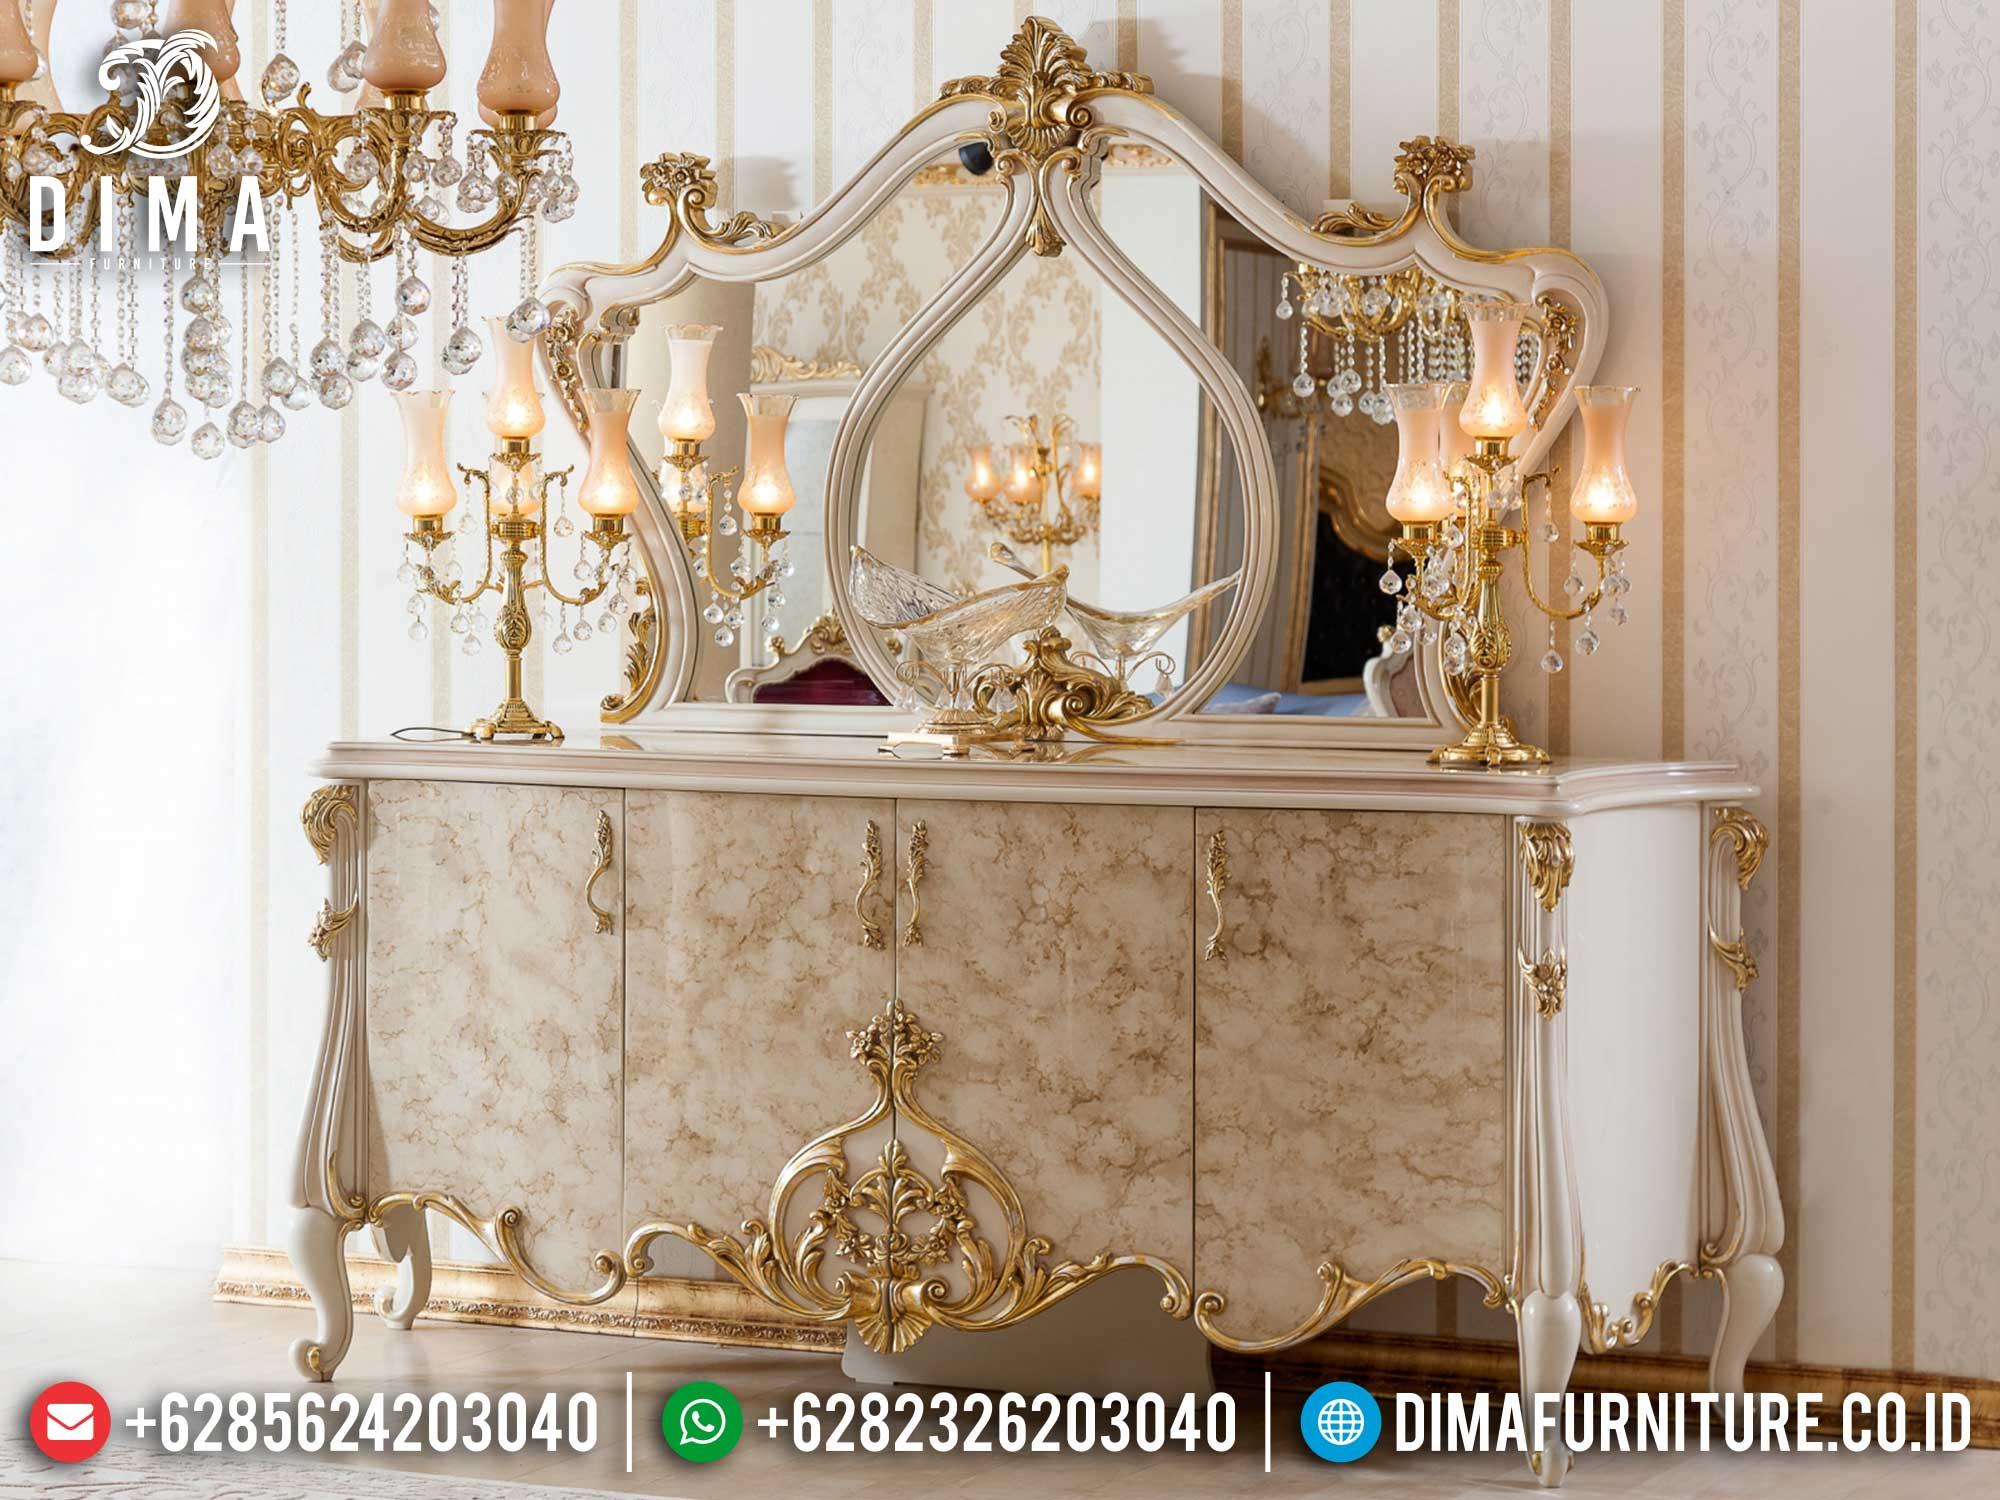 Great Item Meja Konsul Mewah Ukiran Jepara Elegant Luxury Classic Style TTJ-1403